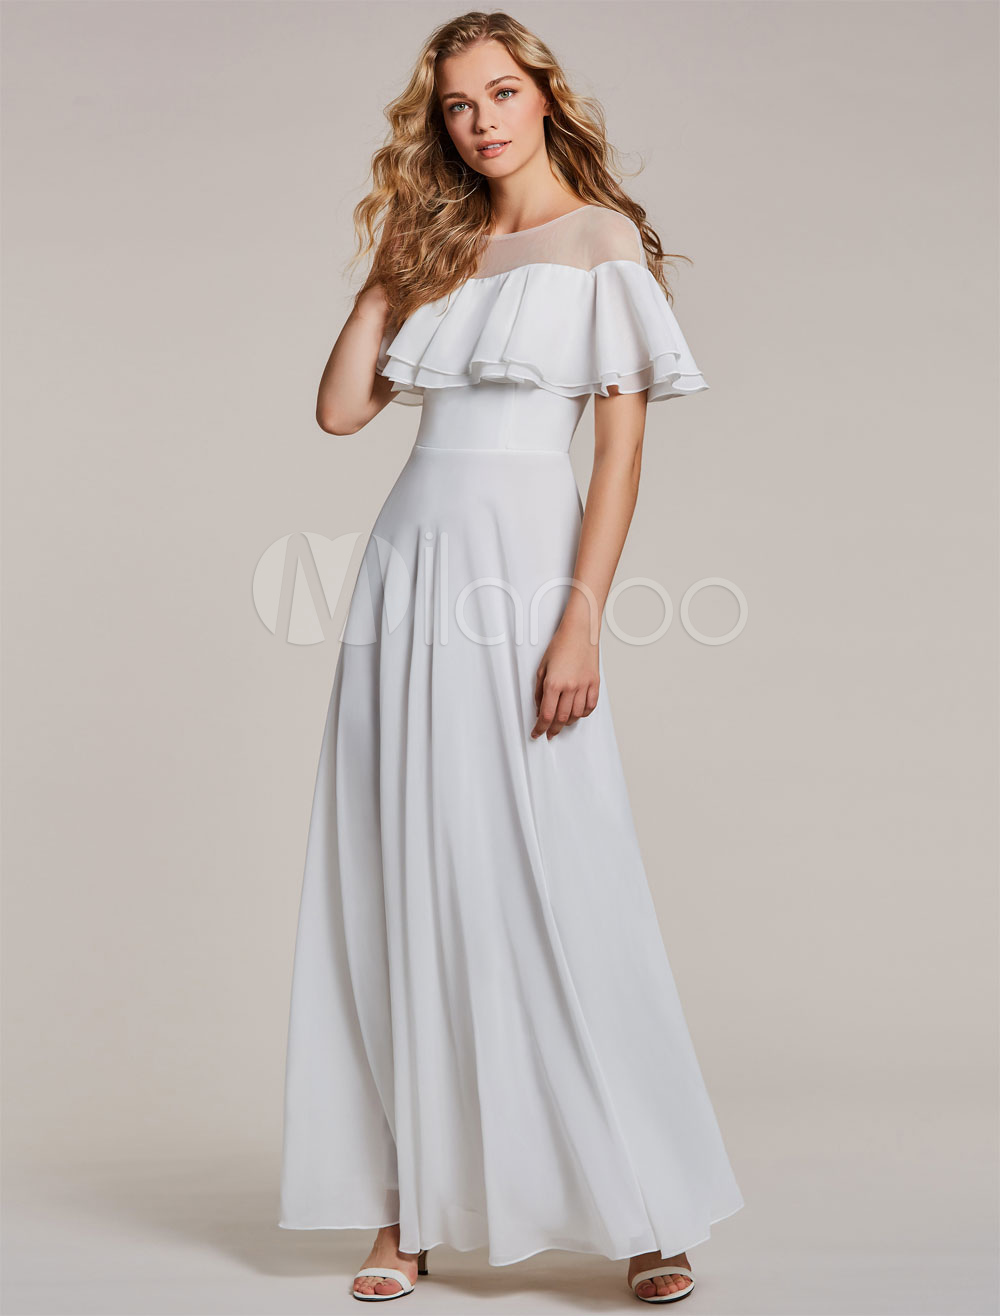 White Prom Dresses Chiffon Short Sleeve Ruffles Tiered Poncho Caplet Dress Women Formal Dresses (Wedding Cheap Party Dress) photo